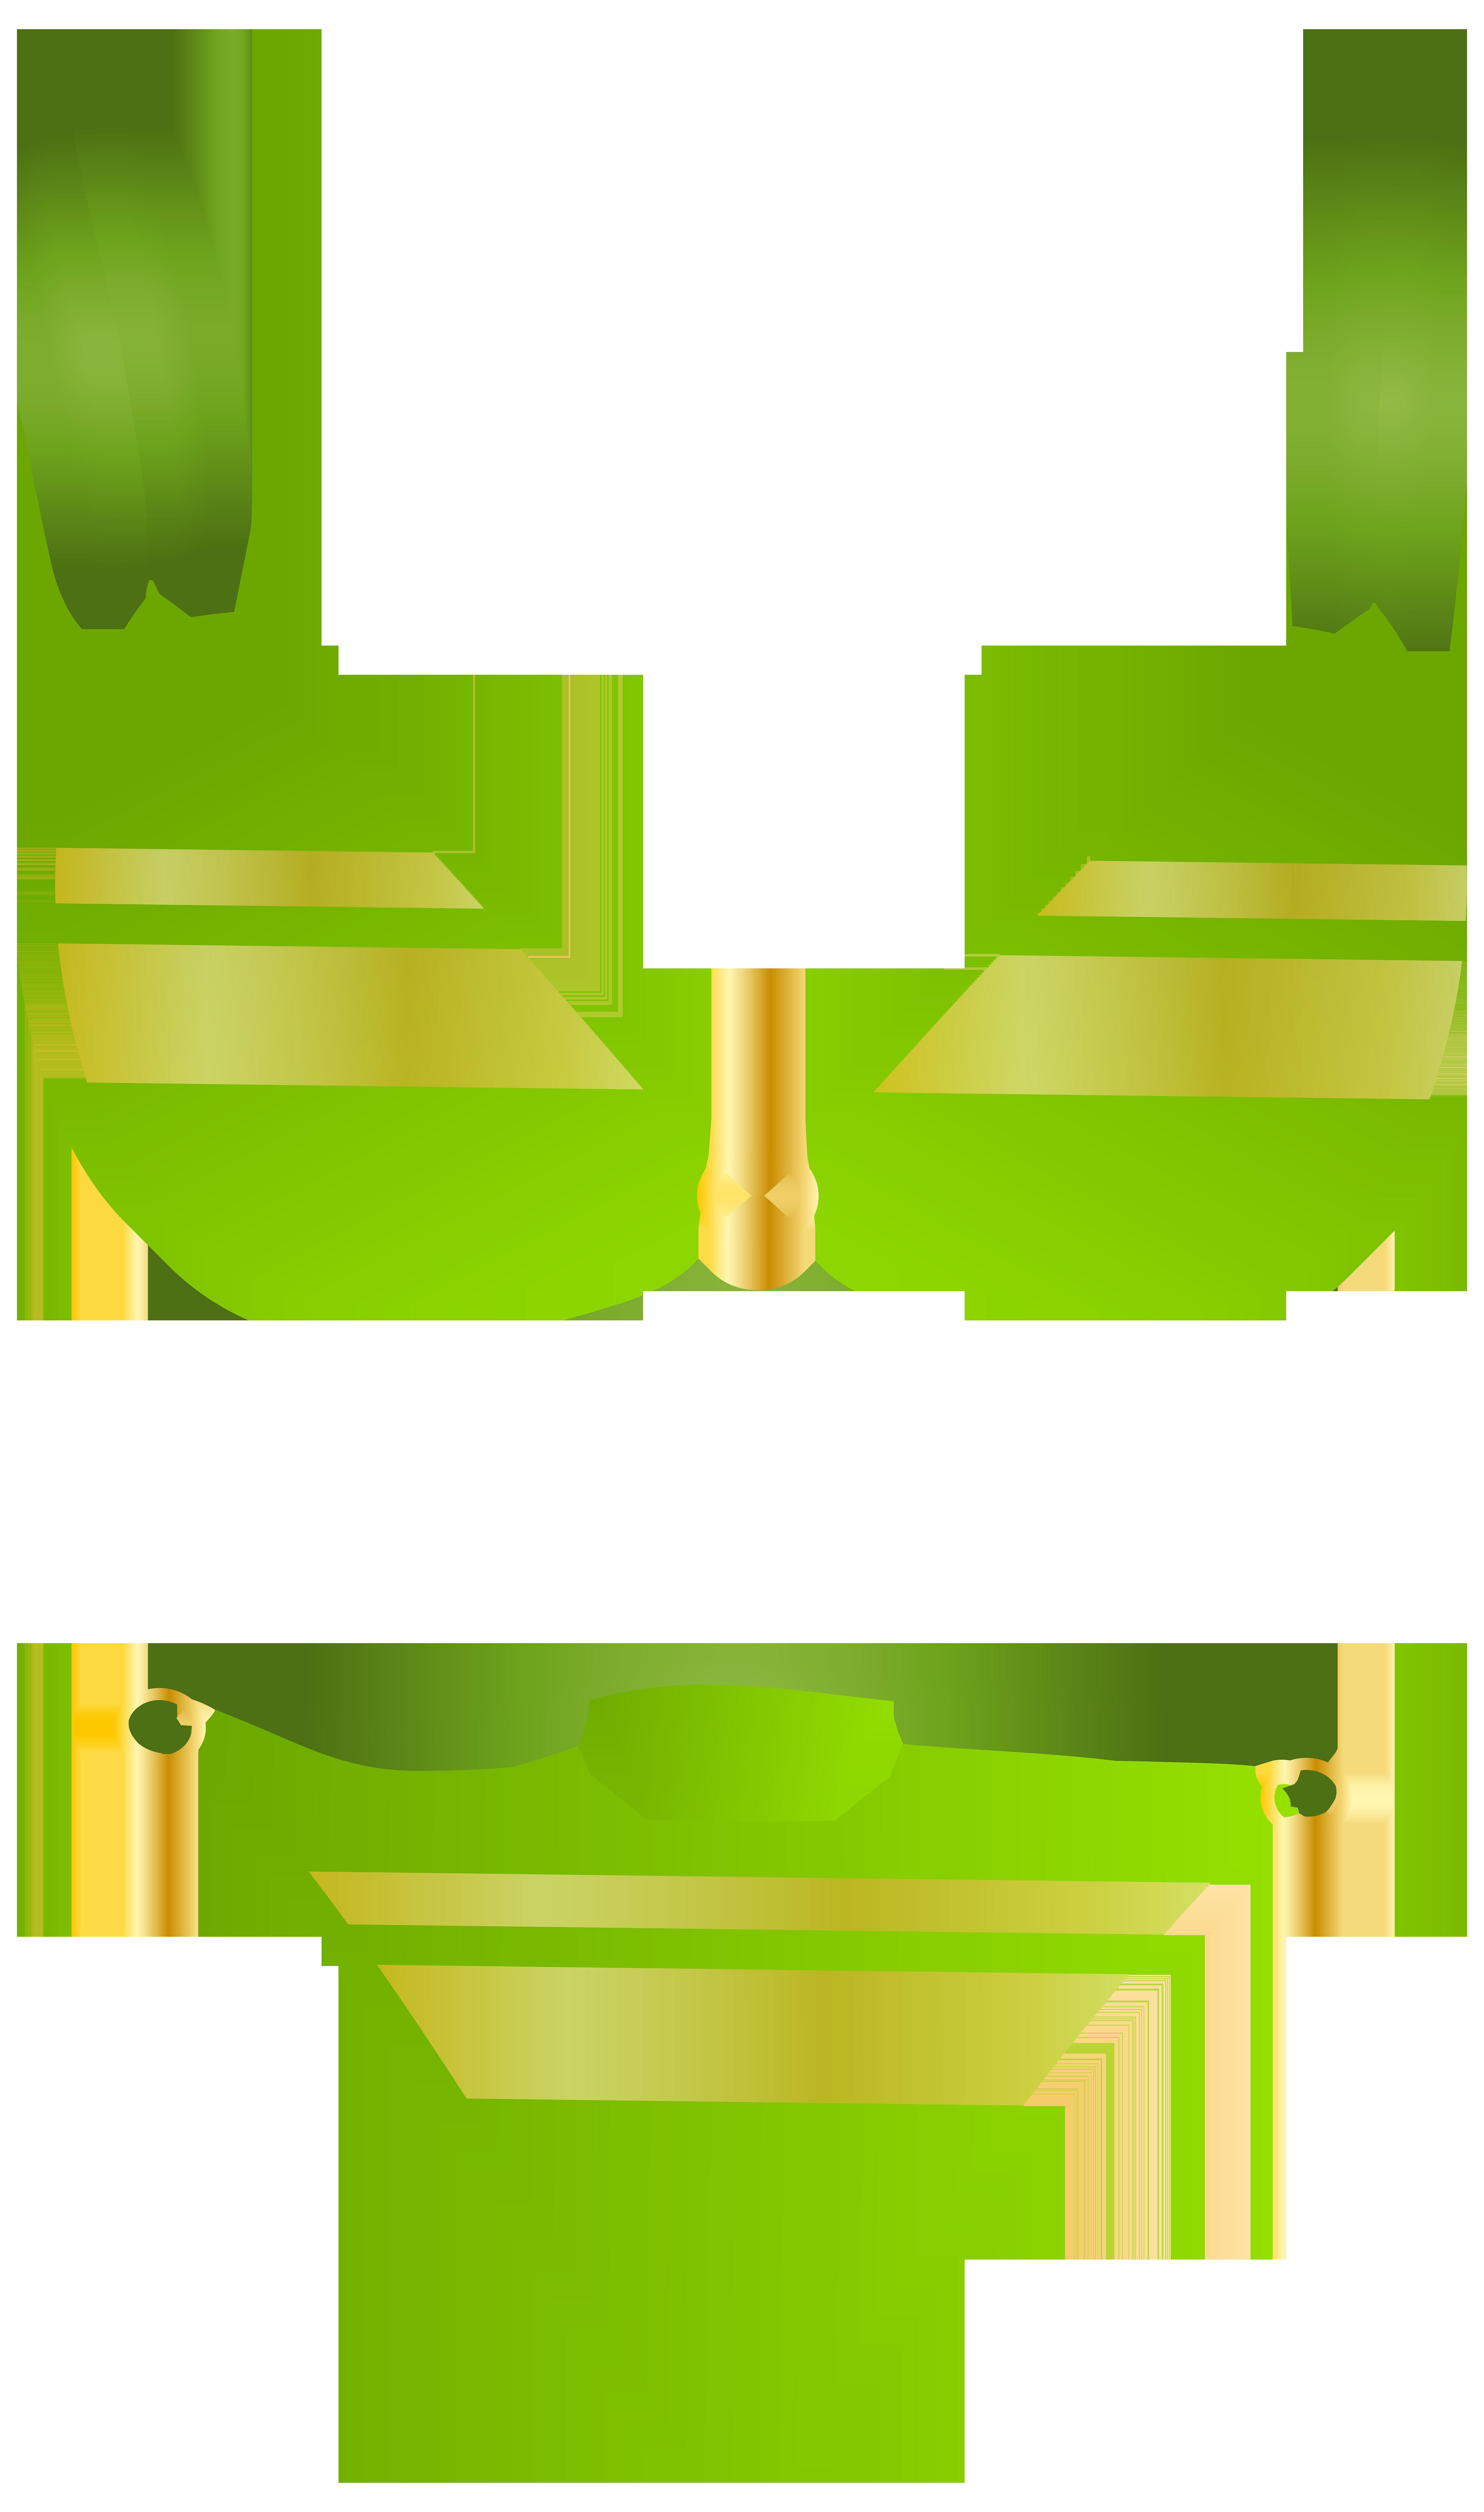 4726x8000 Green Swimsuit Png Clip Art